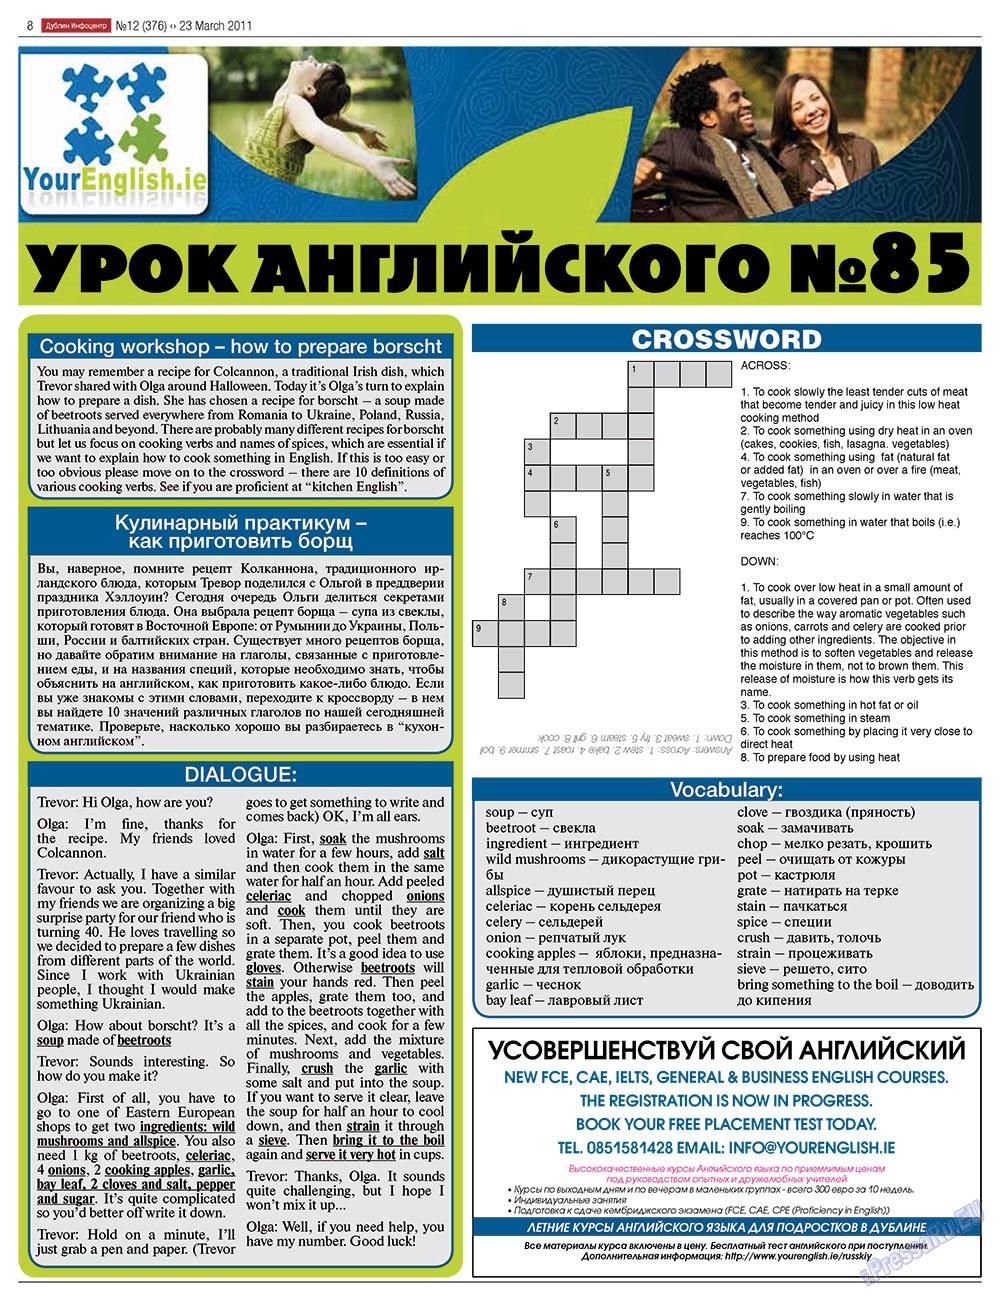 Дублин инфоцентр (газета). 2011 год, номер 12, стр. 8